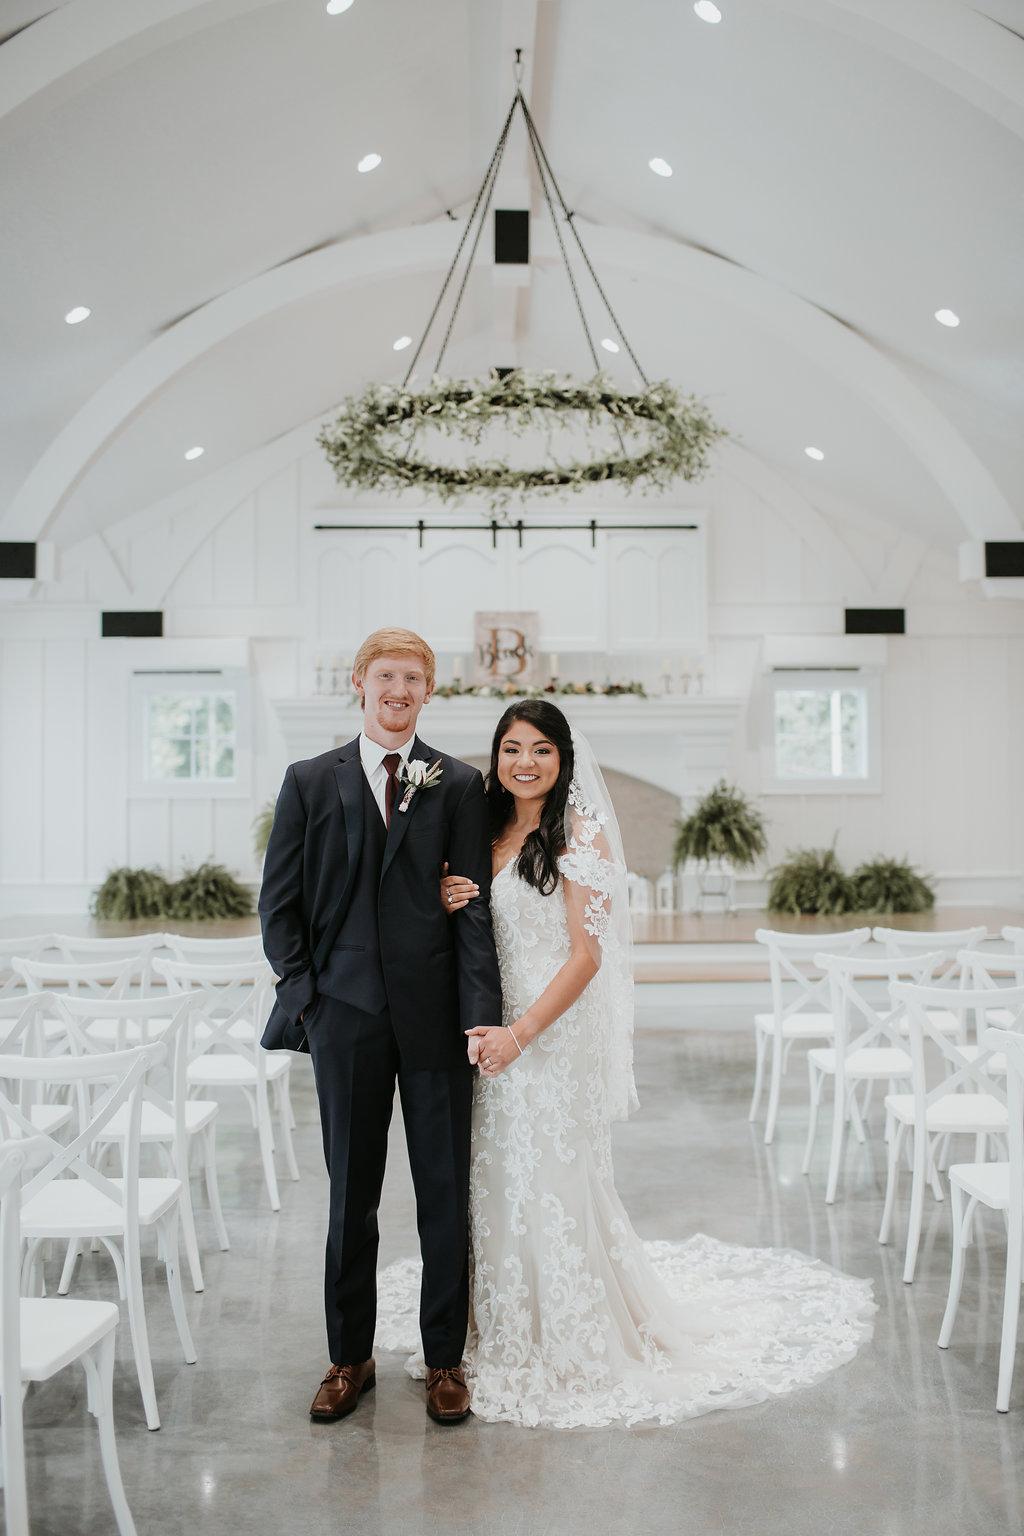 Jacob + Breana - August 25, 2019 - PC: S. Weathington Photography